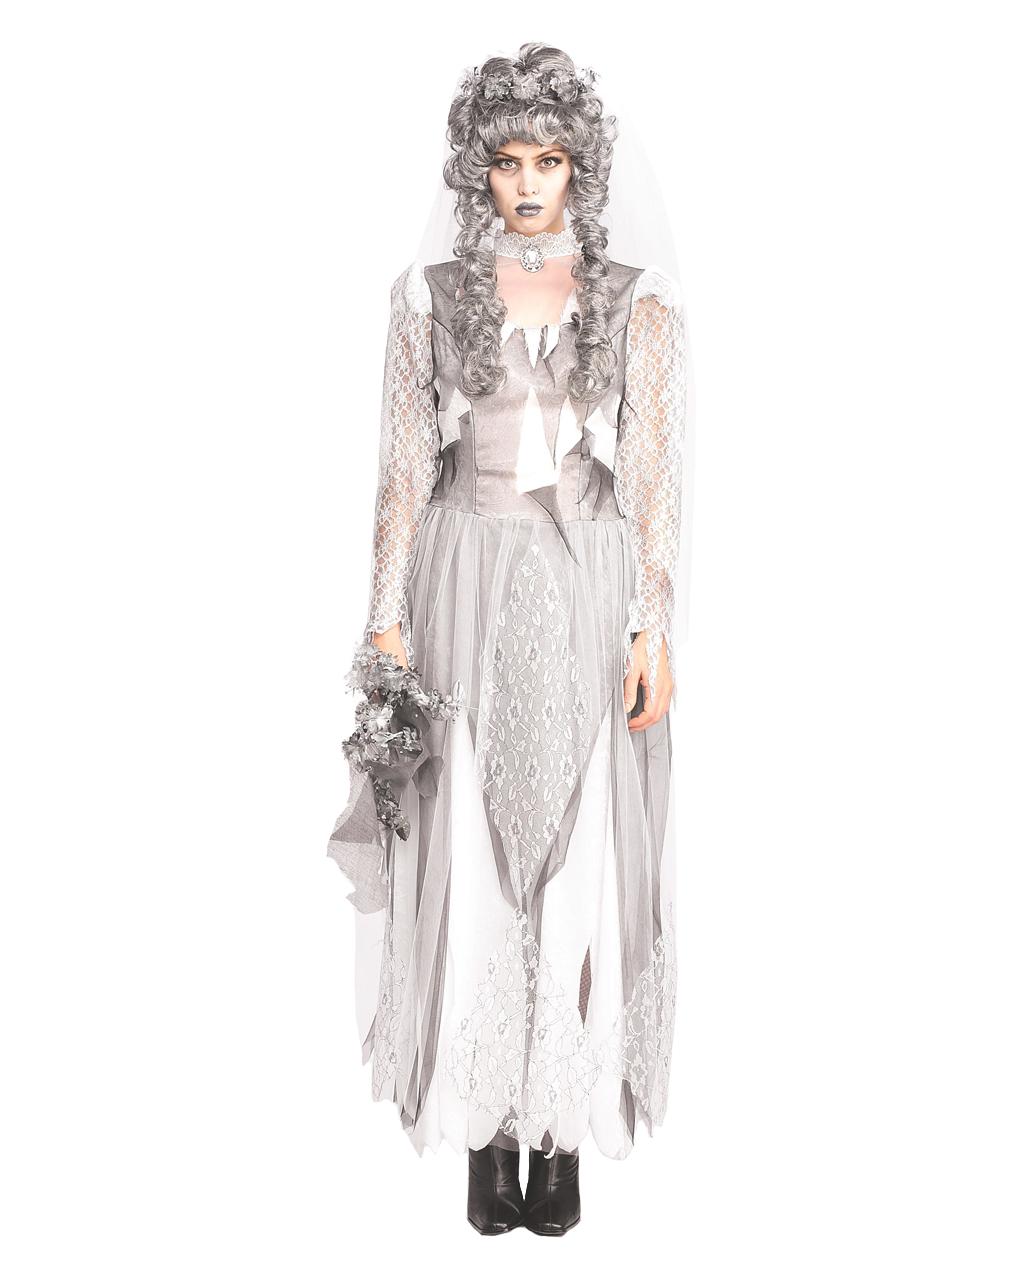 geister braut kostüm -ausgefallene halloween kostüme | horror-shop